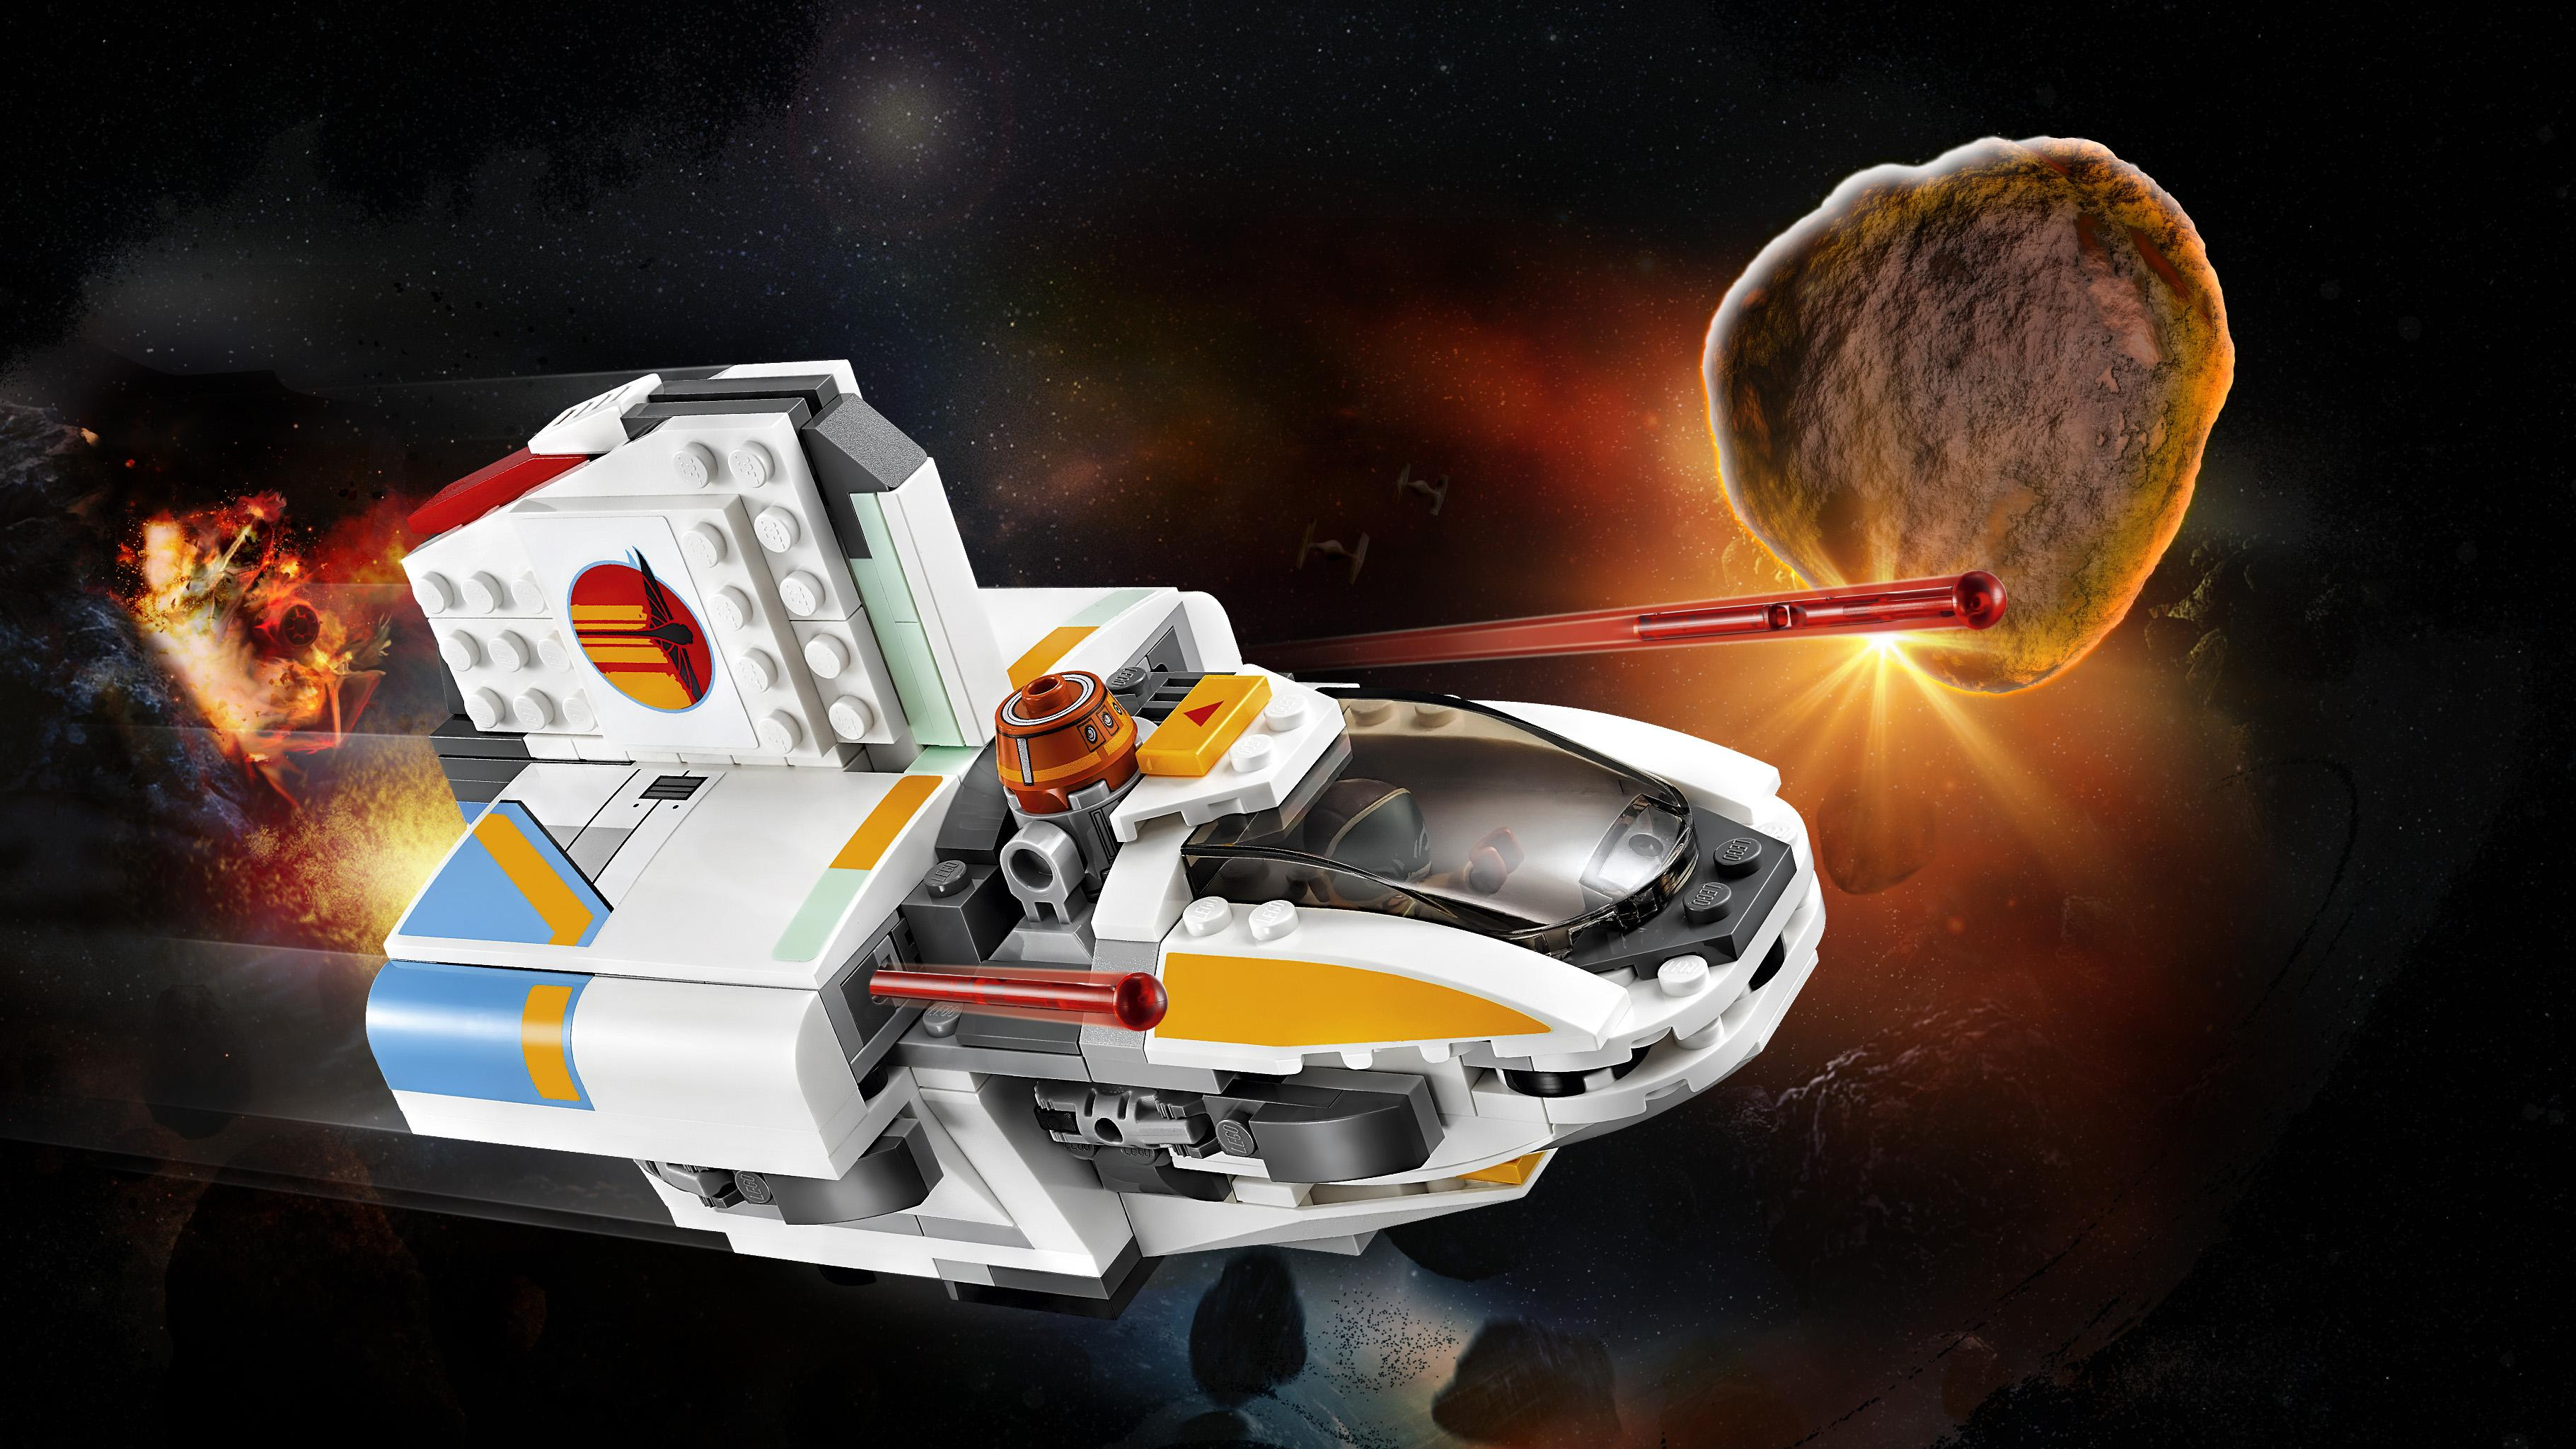 lego star wars the phantom 75170 building kit 269 pieces toys games. Black Bedroom Furniture Sets. Home Design Ideas